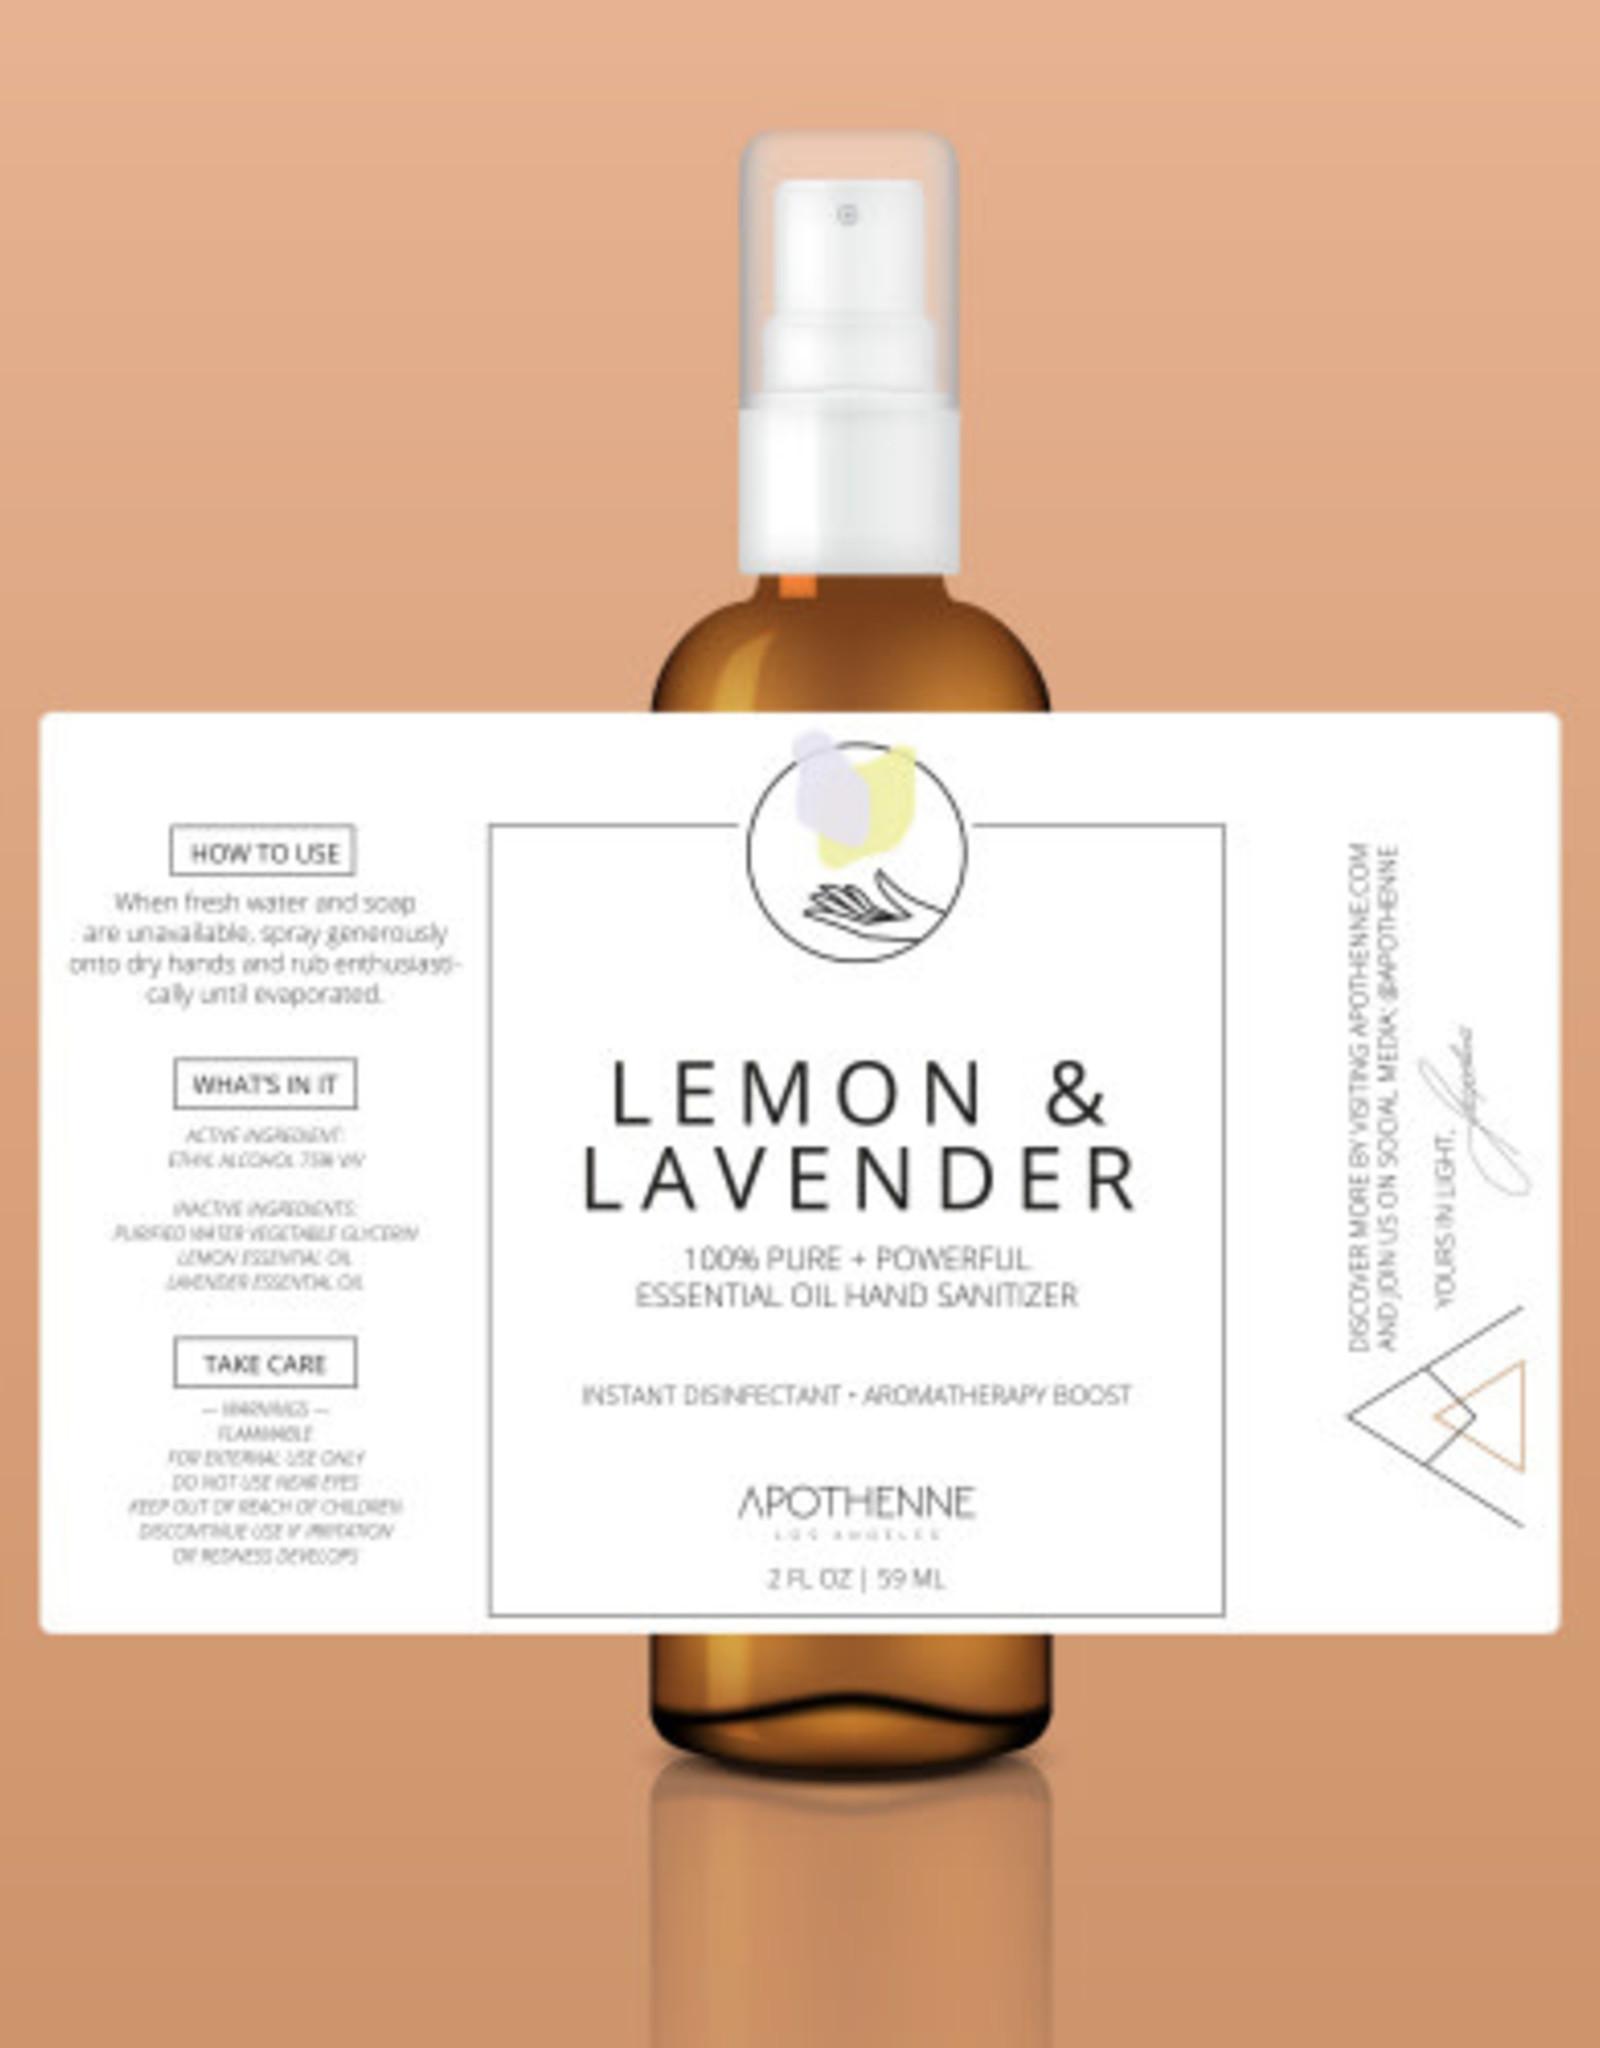 Apothenne 2 oz Hand Sanitizer Lemon & Lavender